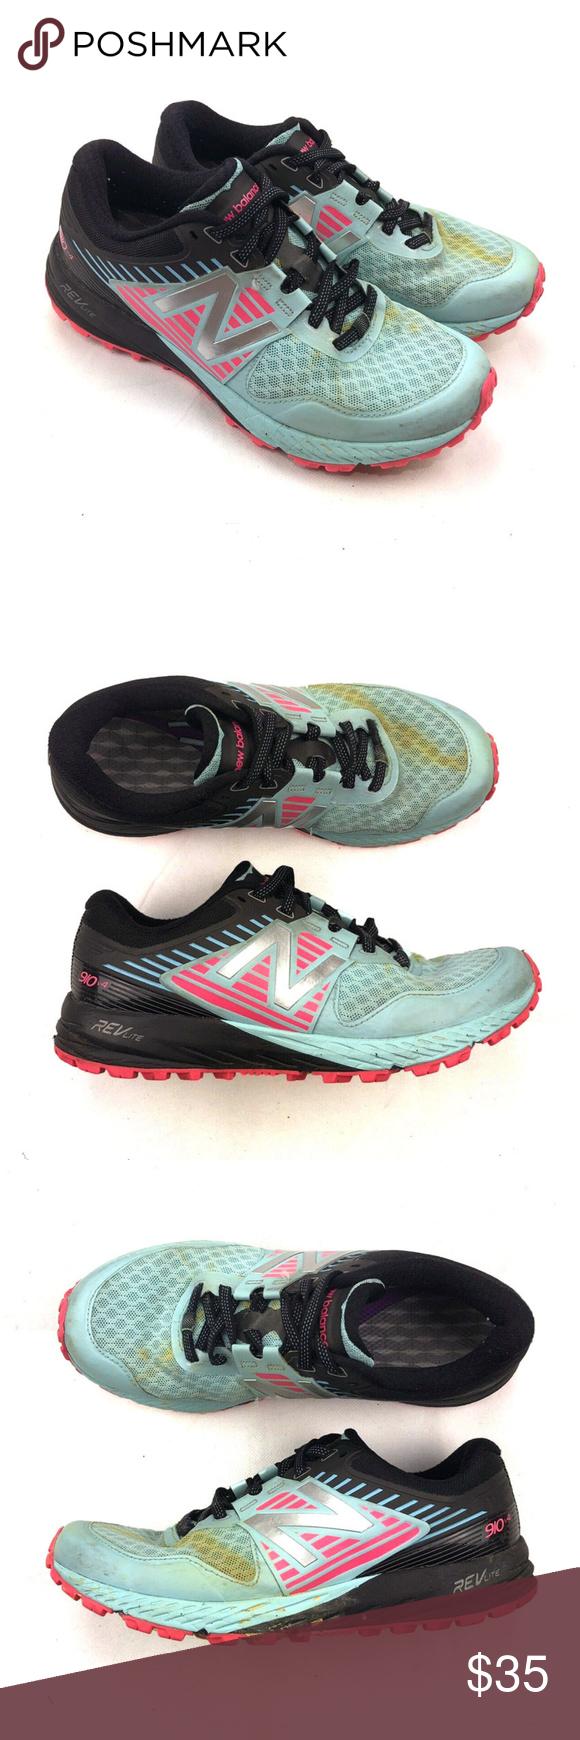 New Balance 910v4 Womens Trail Running Shoes Sz6.5